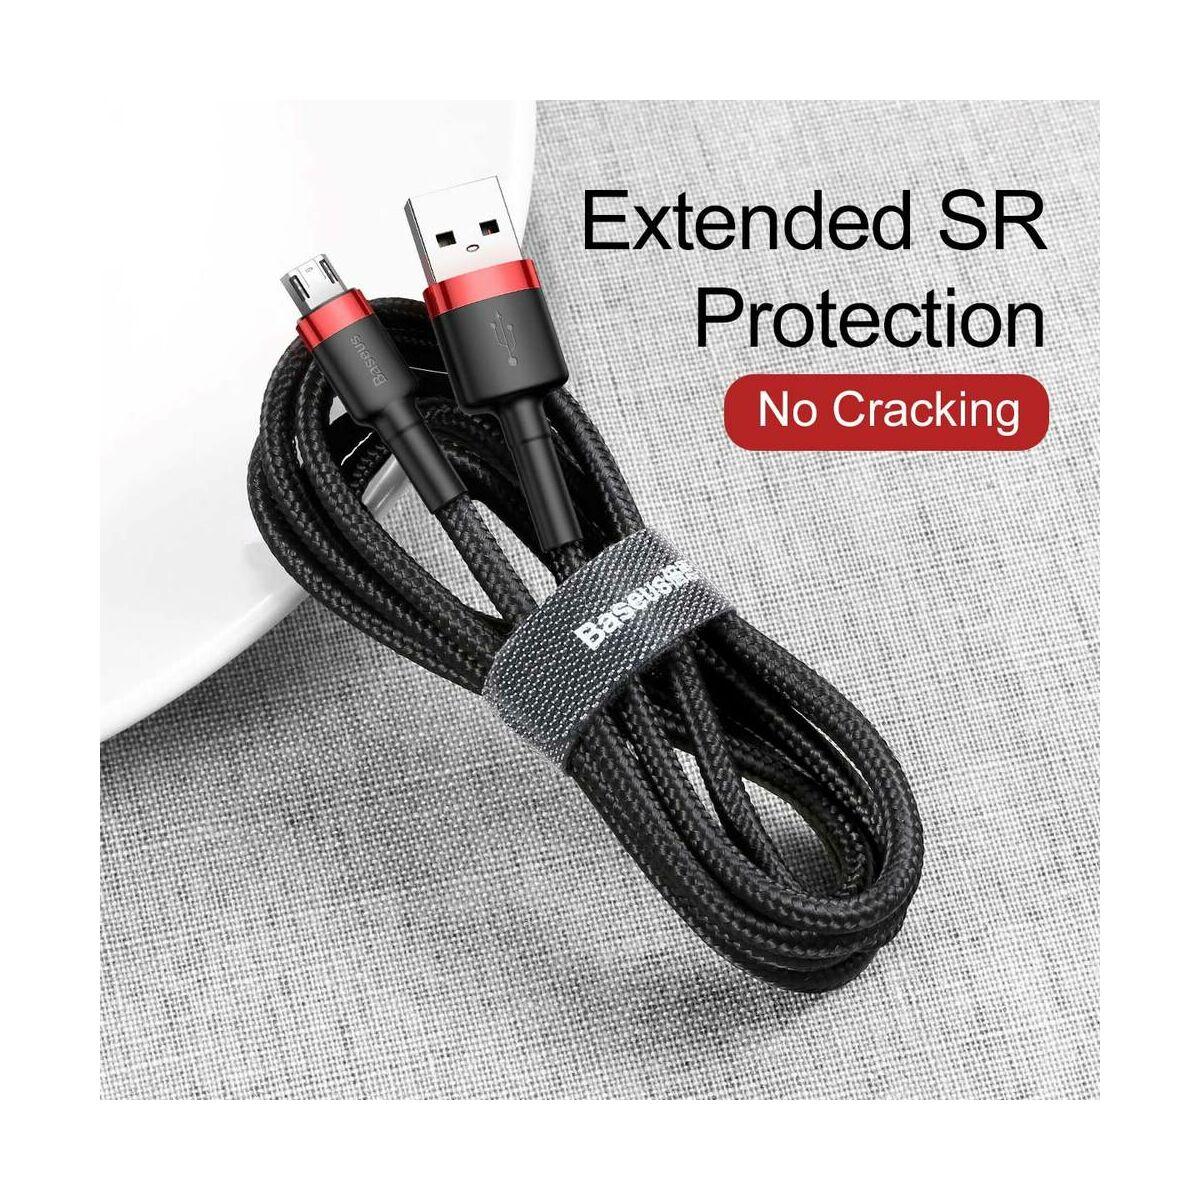 Baseus Micro USB kábel, Cafule 2.4A, 1m, piros/fekete (CAMKLF-B91)